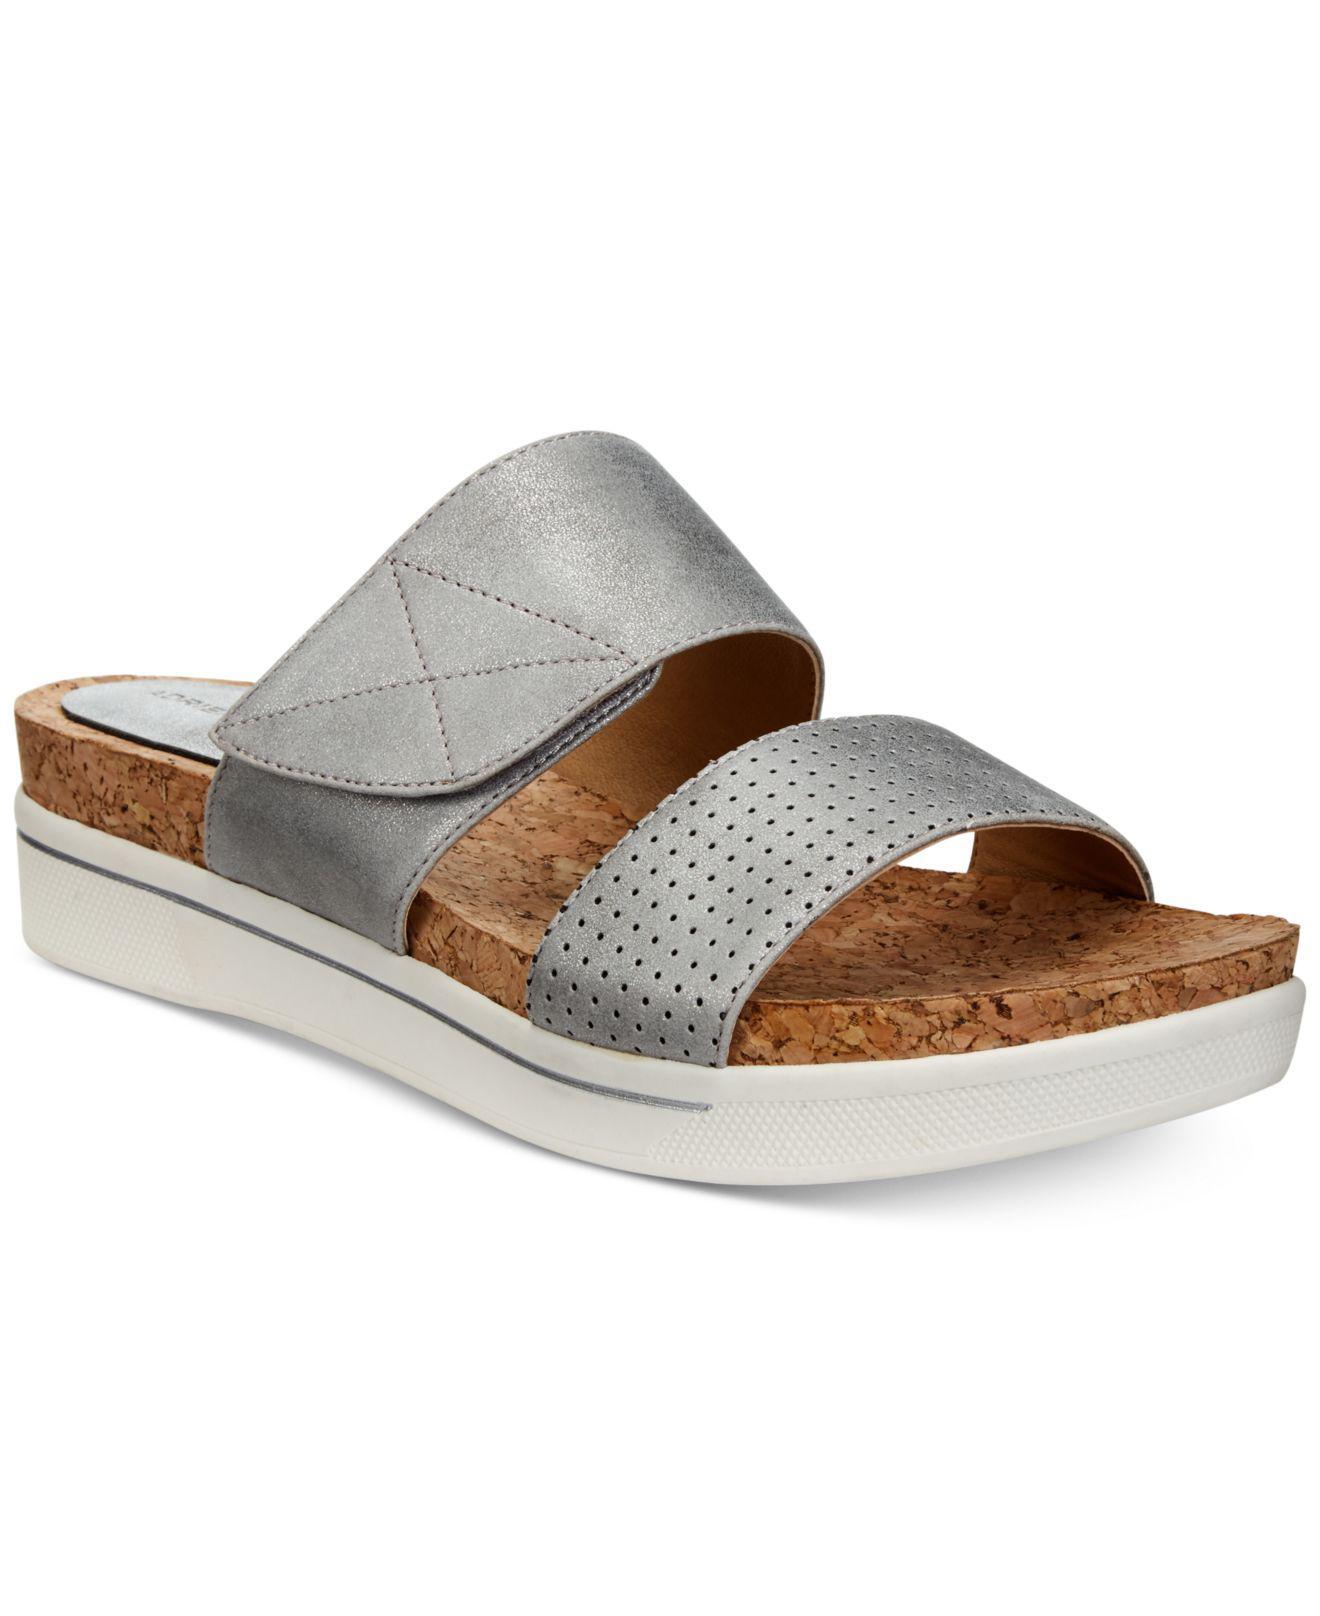 8a95e20227af Lyst - Adrienne Vittadini Calais Flat Sandals in Metallic